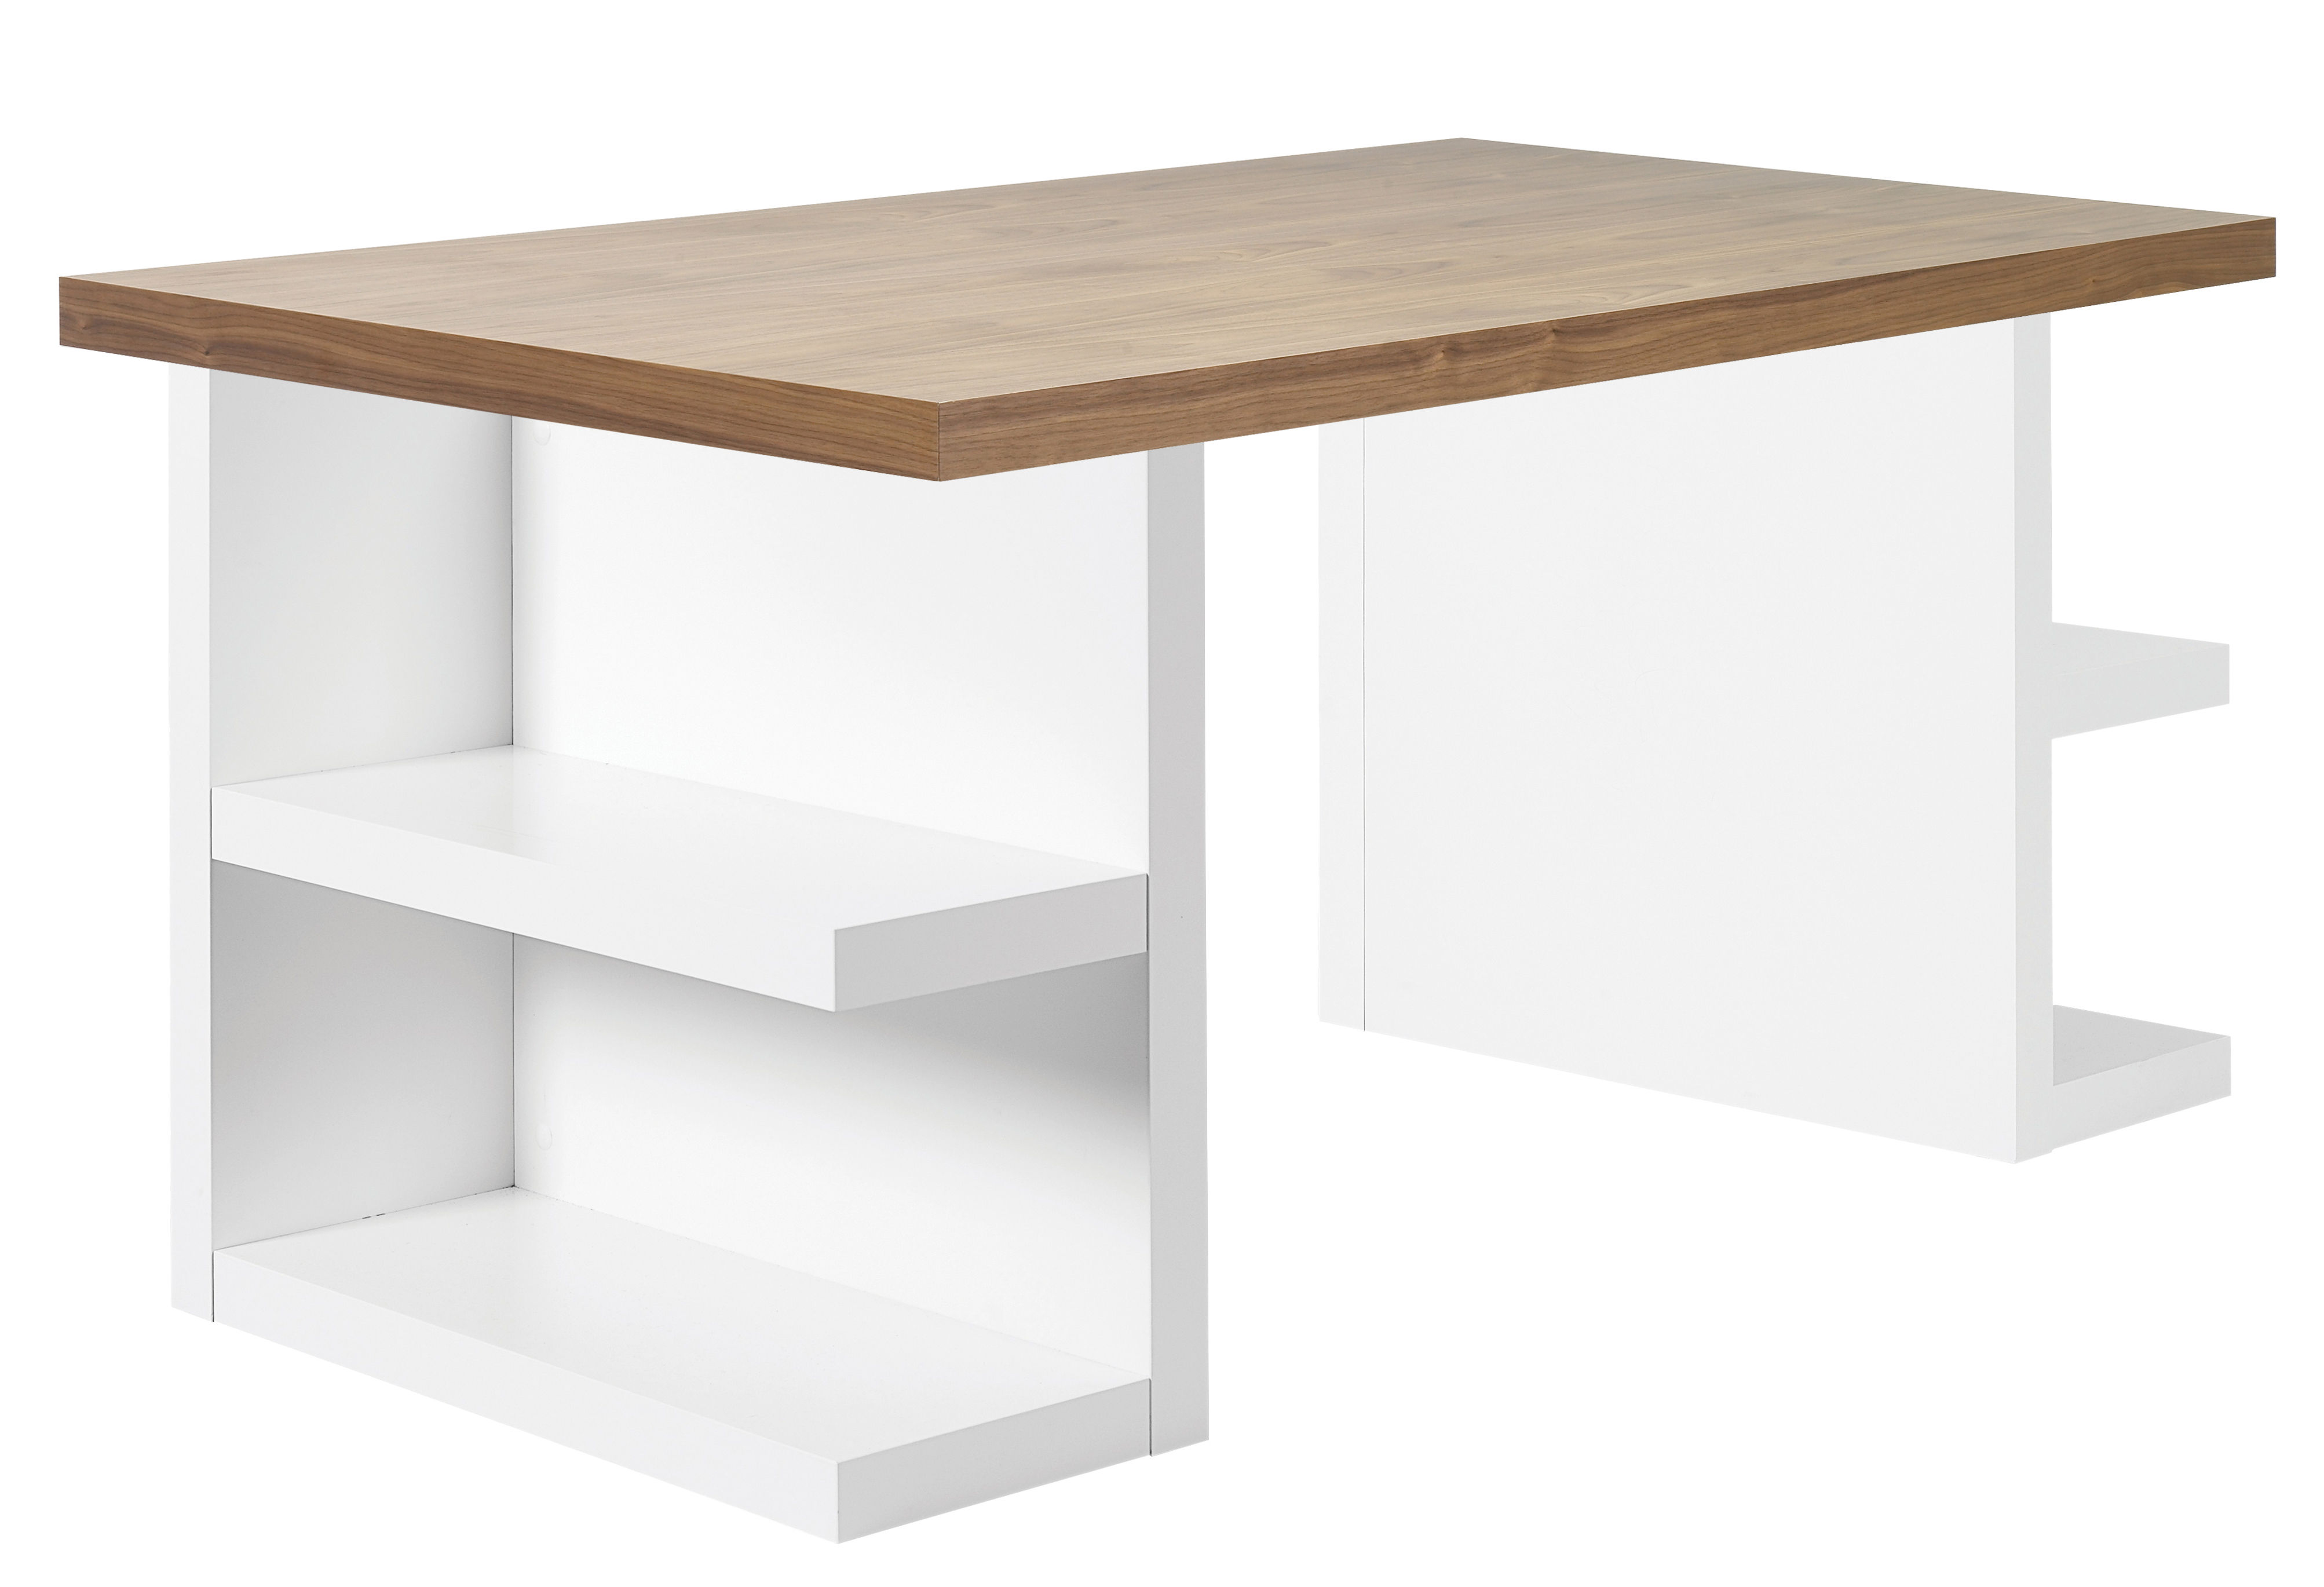 Furniture - Office Furniture - Storage Desk - L 180 cm by POP UP HOME - Walnut / White leg - Painted chipboard, Walnut plywood